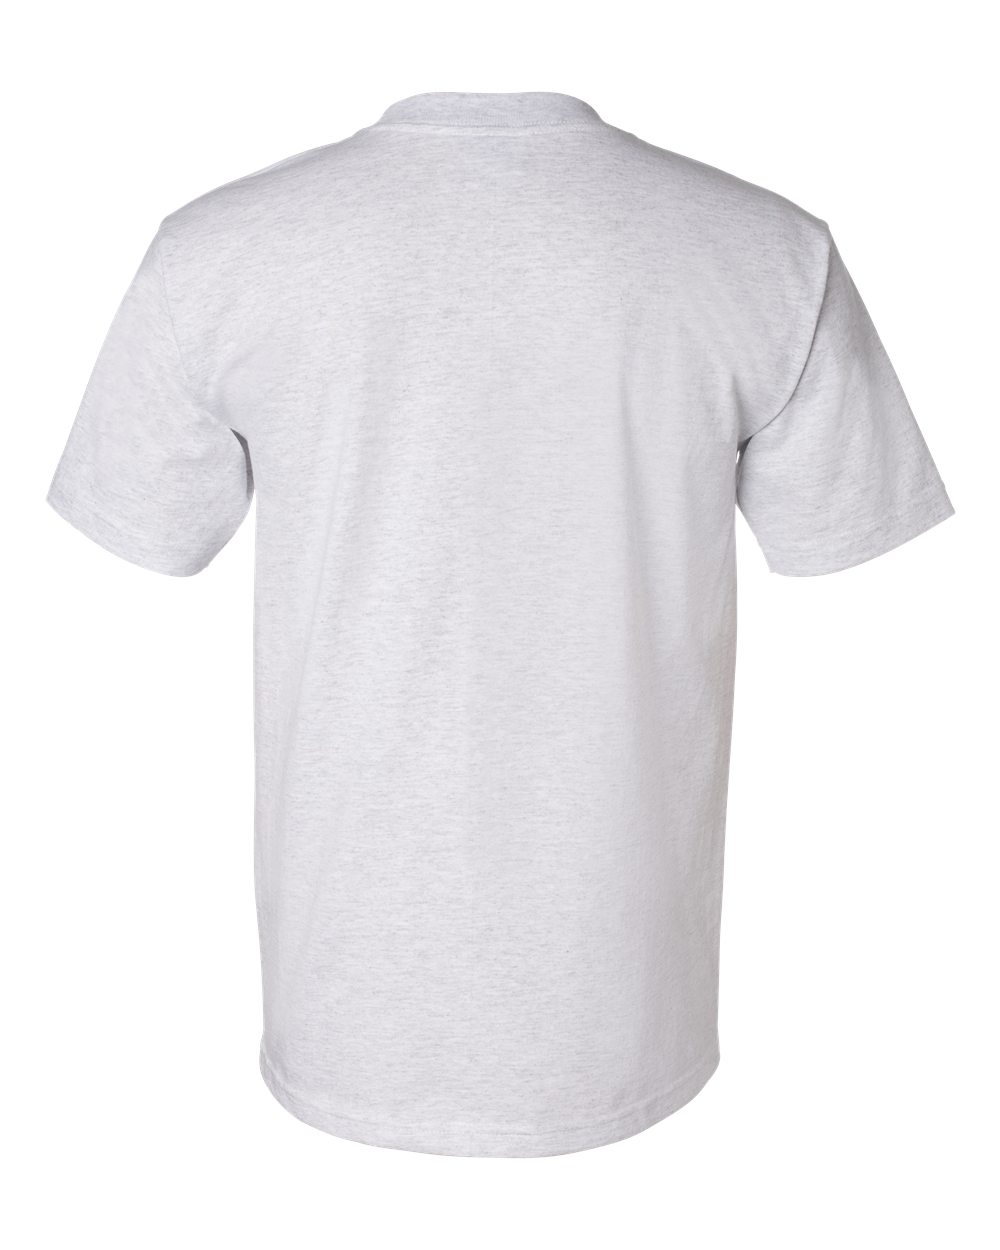 Bayside-Mens-Cotton-Blank-USA-Made-Short-Sleeve-T-Shirt-5100-up-to-5XL thumbnail 7